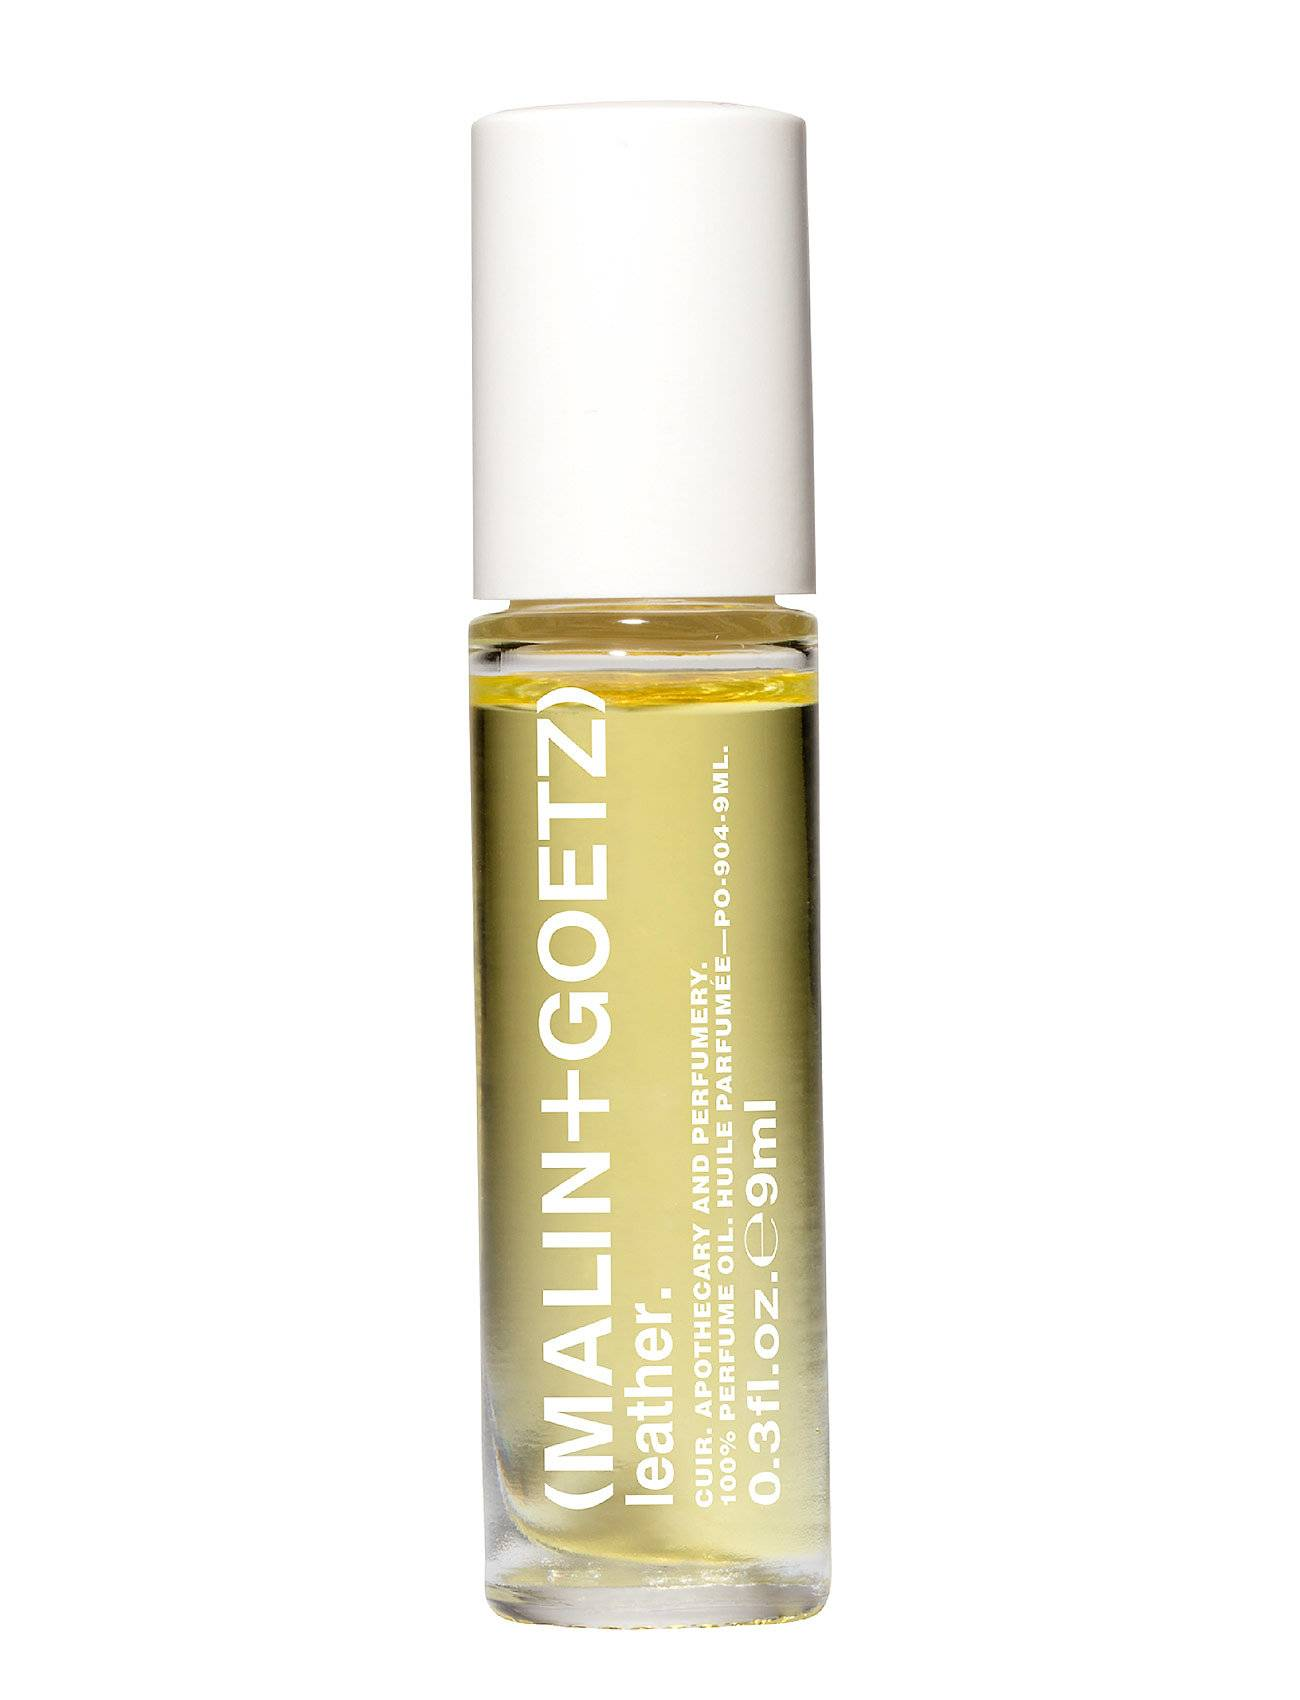 MALIN+GOETZ Leather Perfume Oil Hajuvesi Parfyymi Nude MALIN+GOETZ